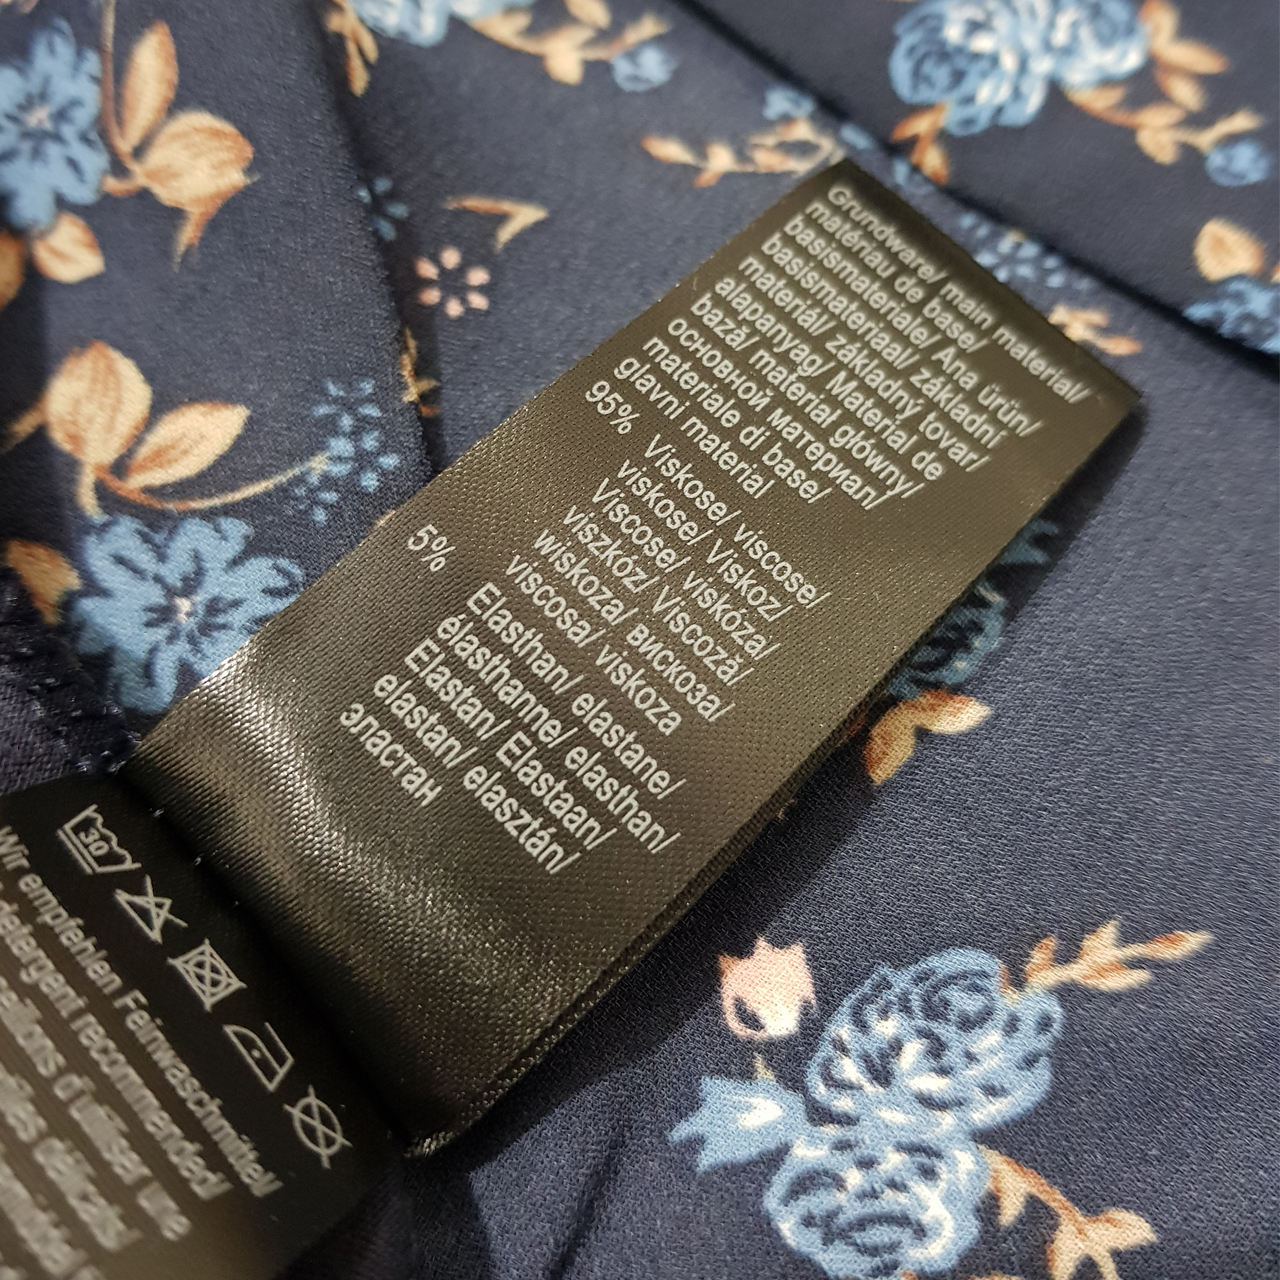 تیشرت زنانه چیبو مدل 349336 -  - 7